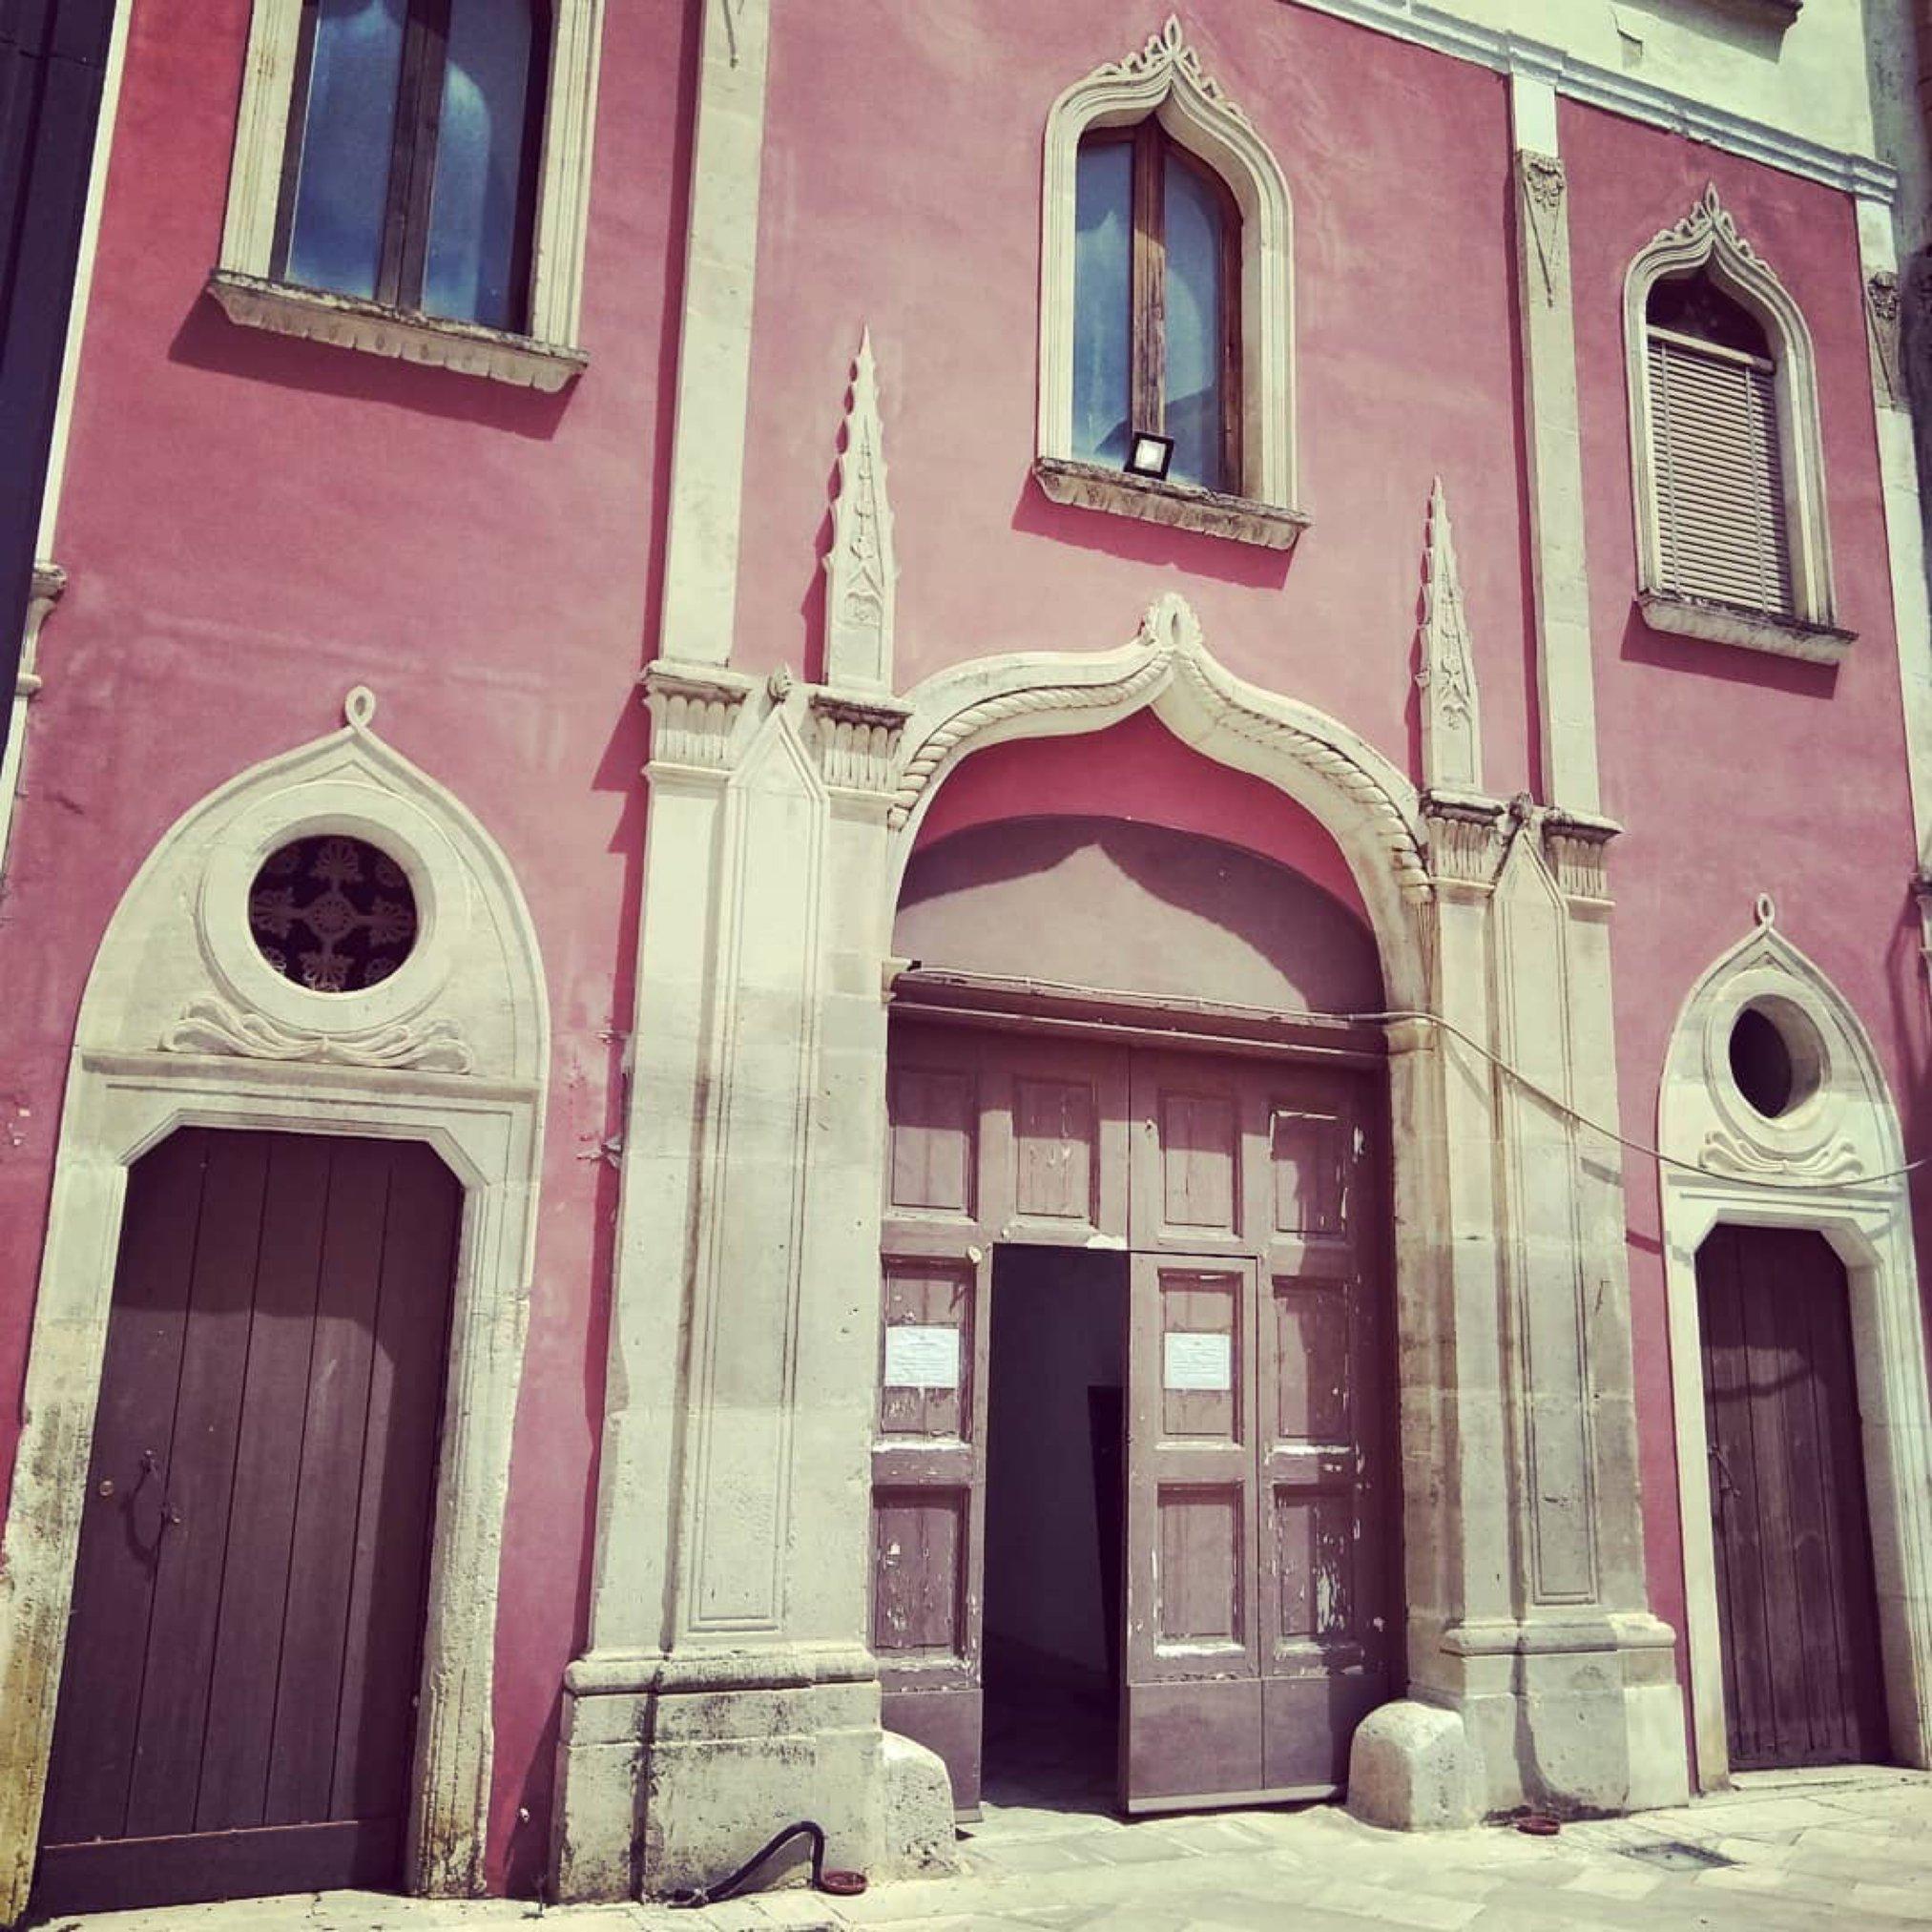 Palazzo Catalano  - Via Vittorio Emanuele, Castellaneta (TA)